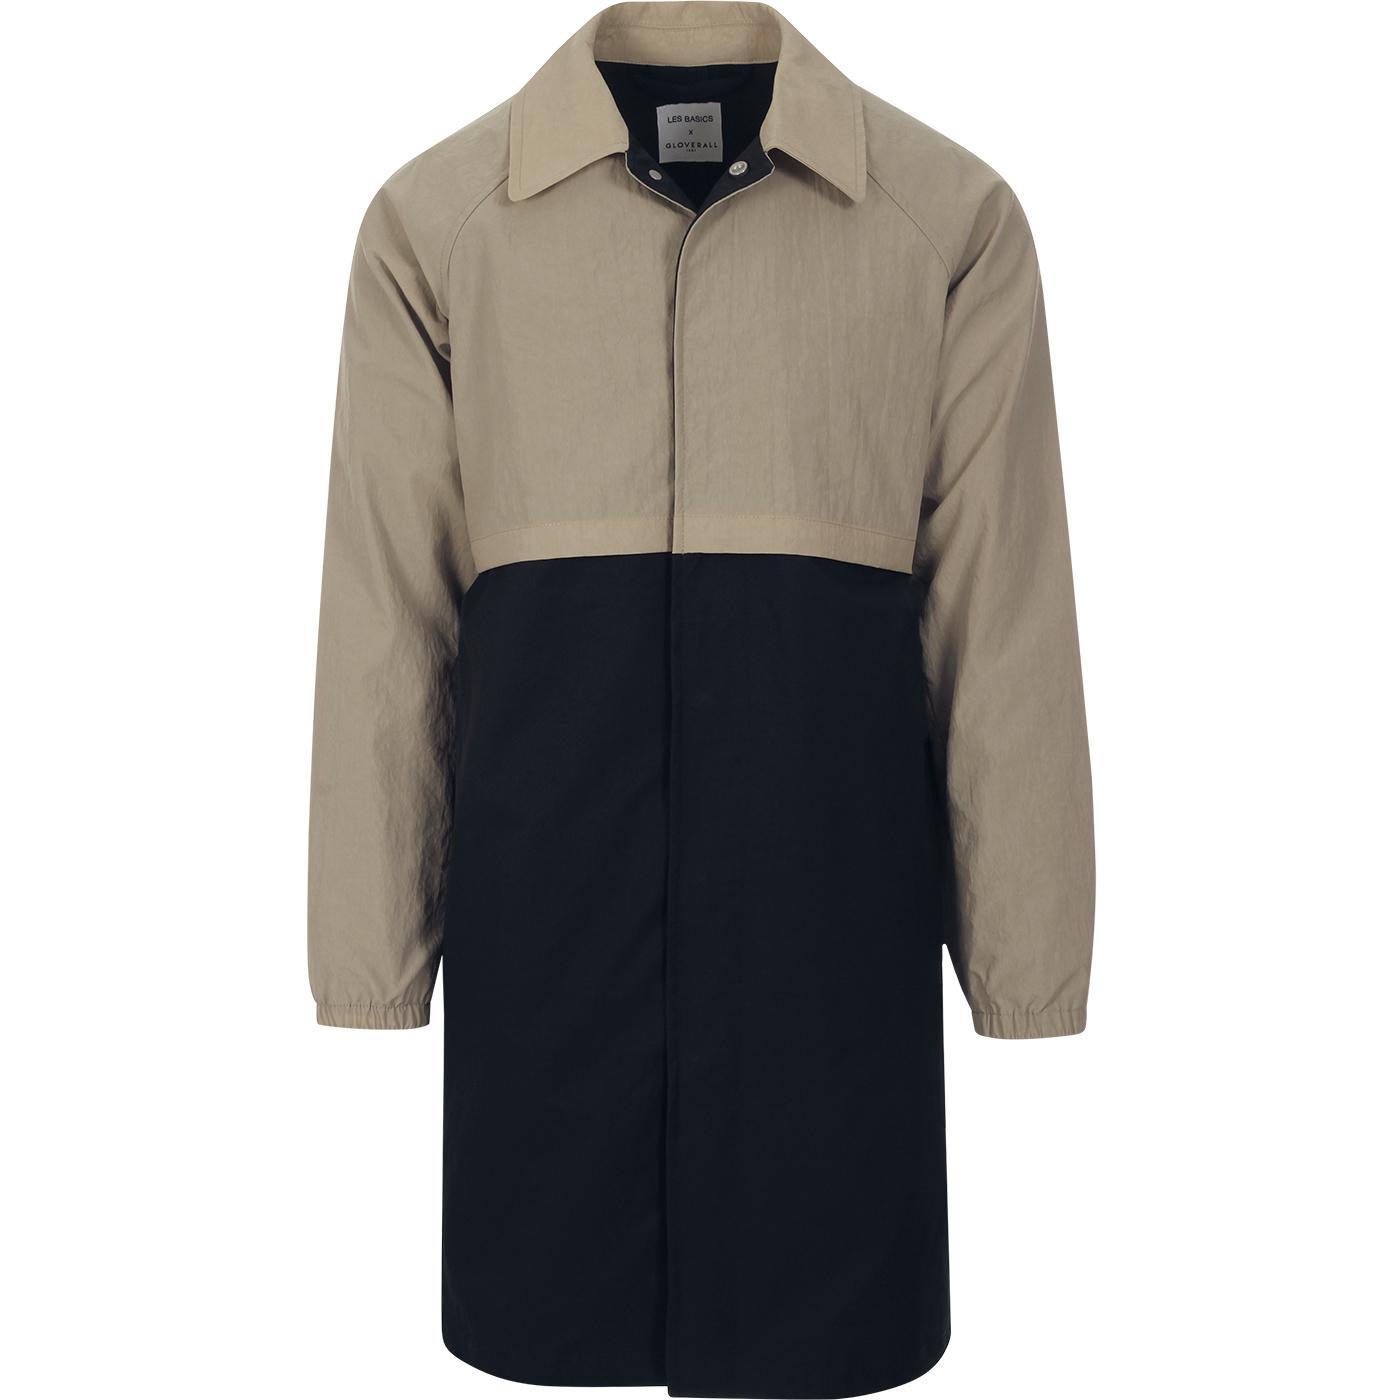 GLOVERALL X LES BASICS Men's Le Car Coat Navy